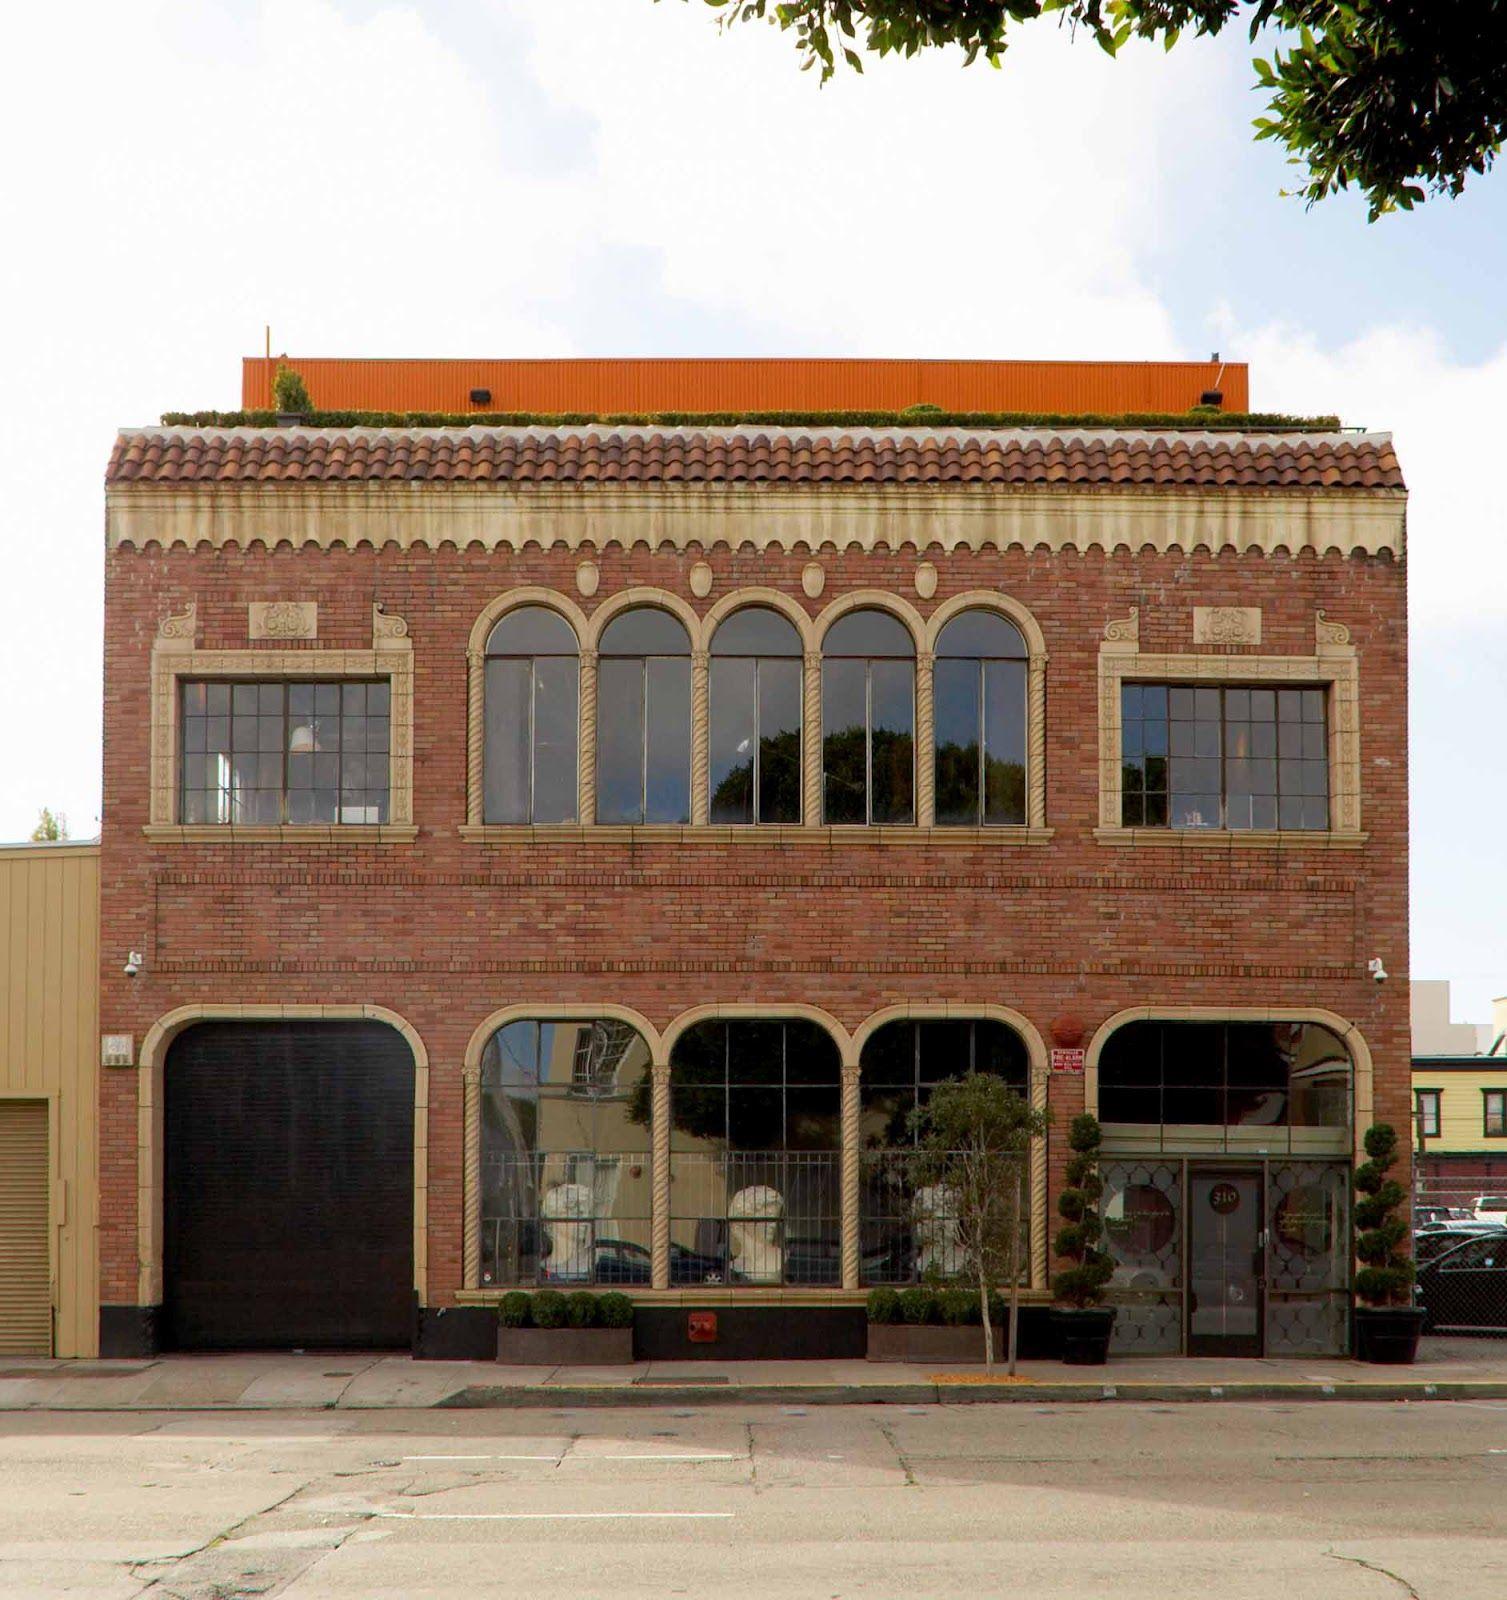 Old Brick Apartment Building: Loft Building With1920's, Moorish/Venetian Exterior